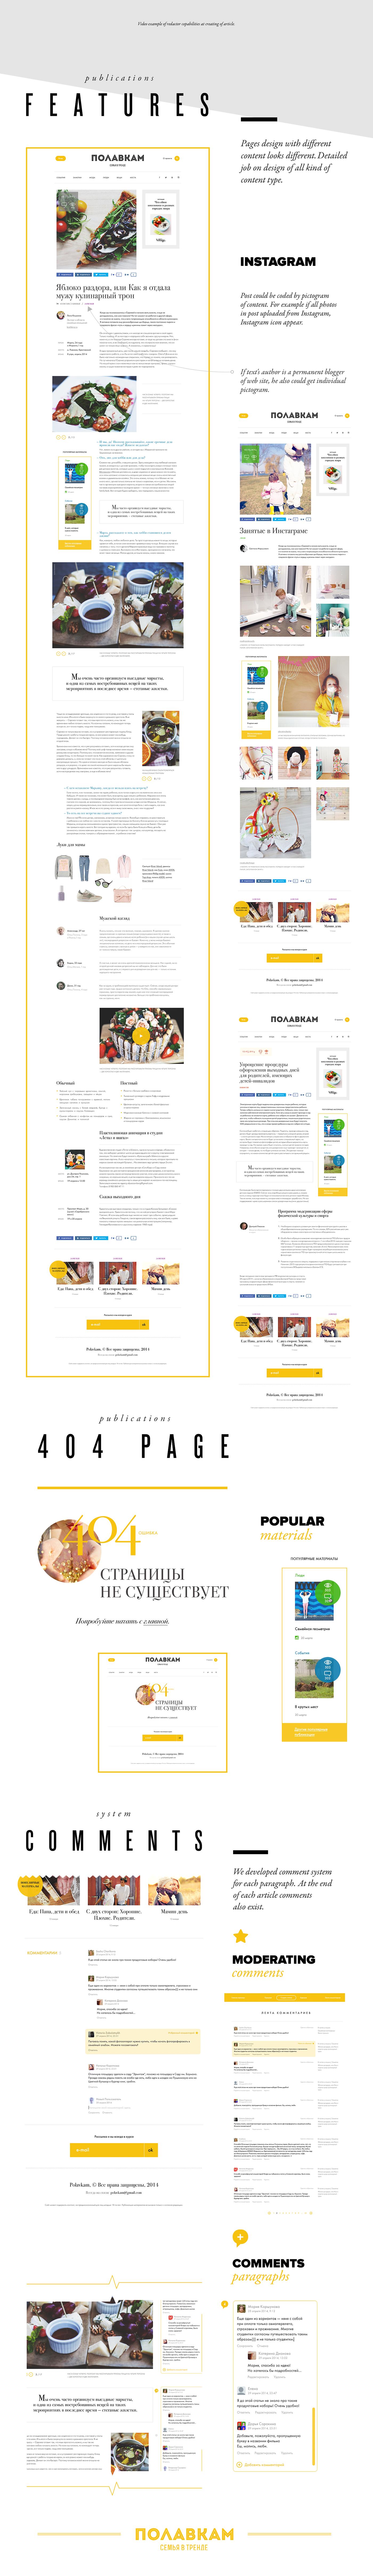 Website minimal UI ux flat family media article Editor